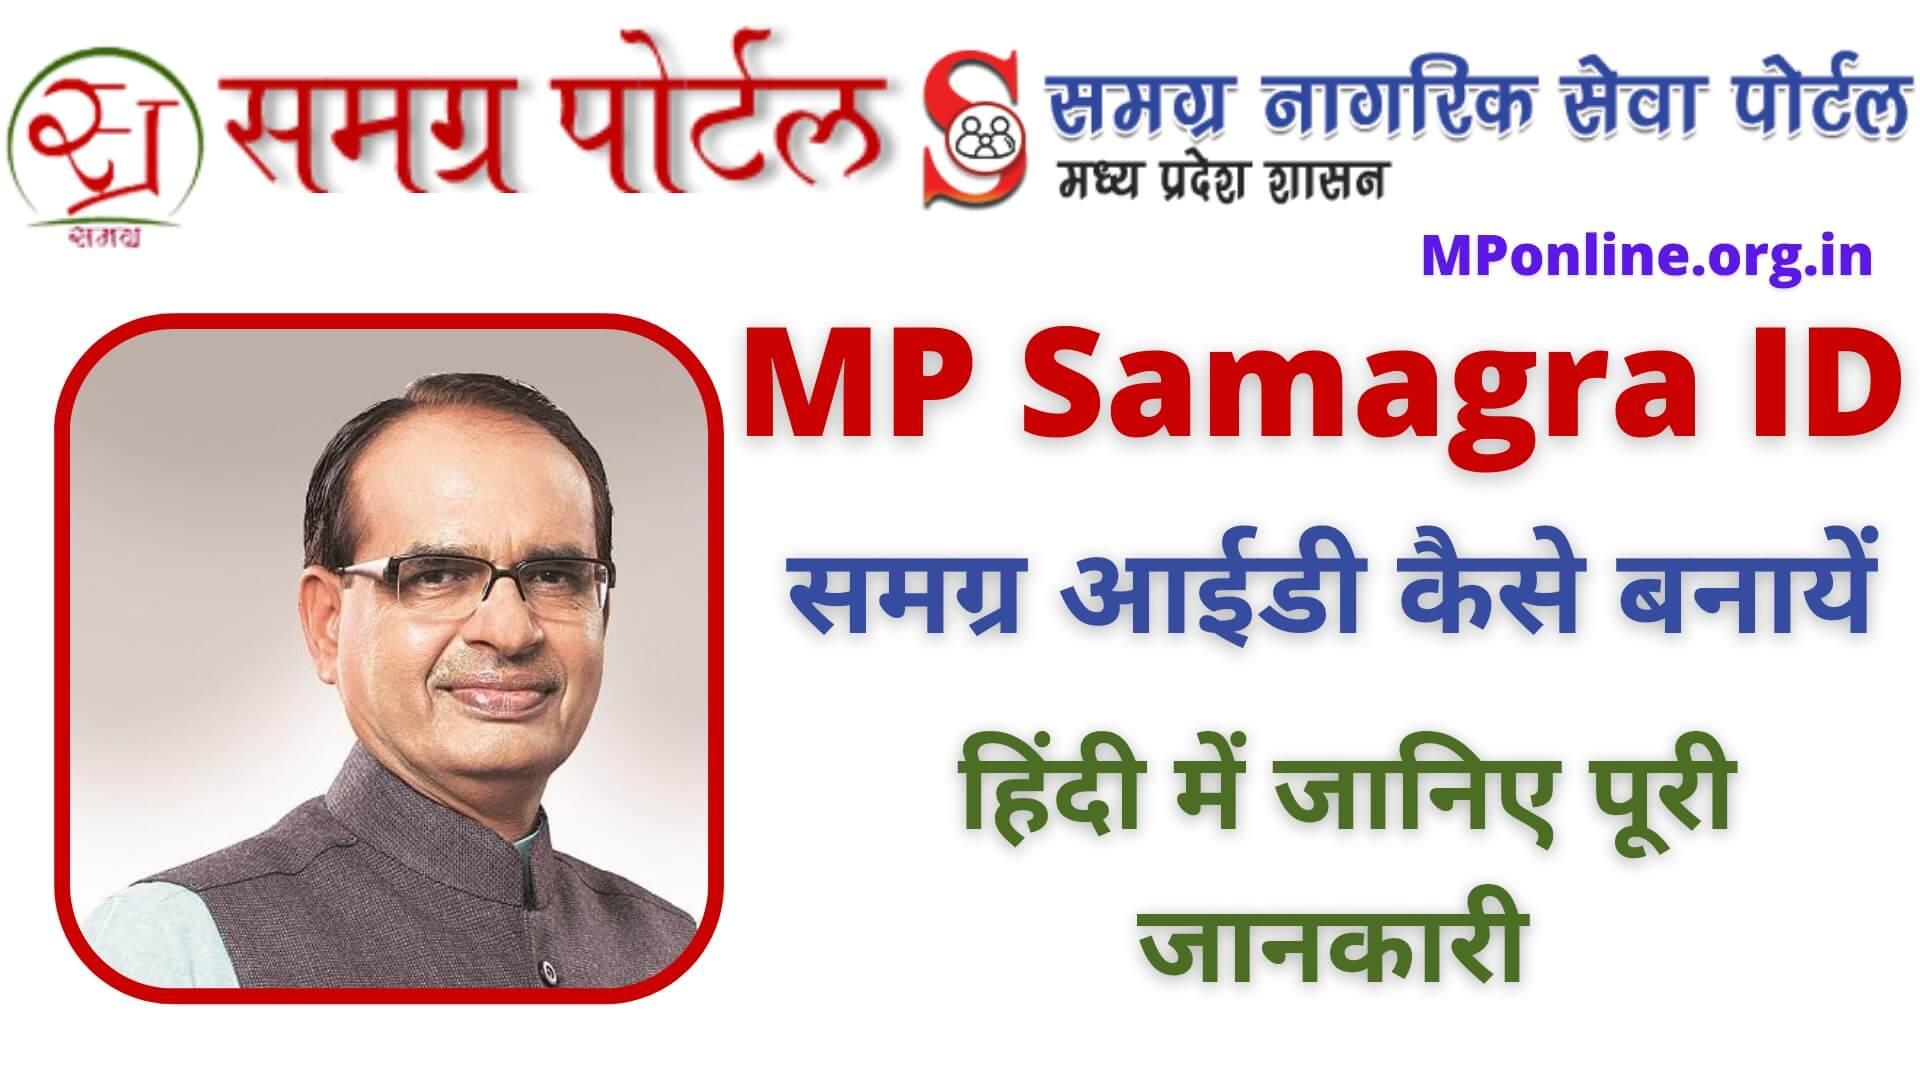 MP Samagra ID